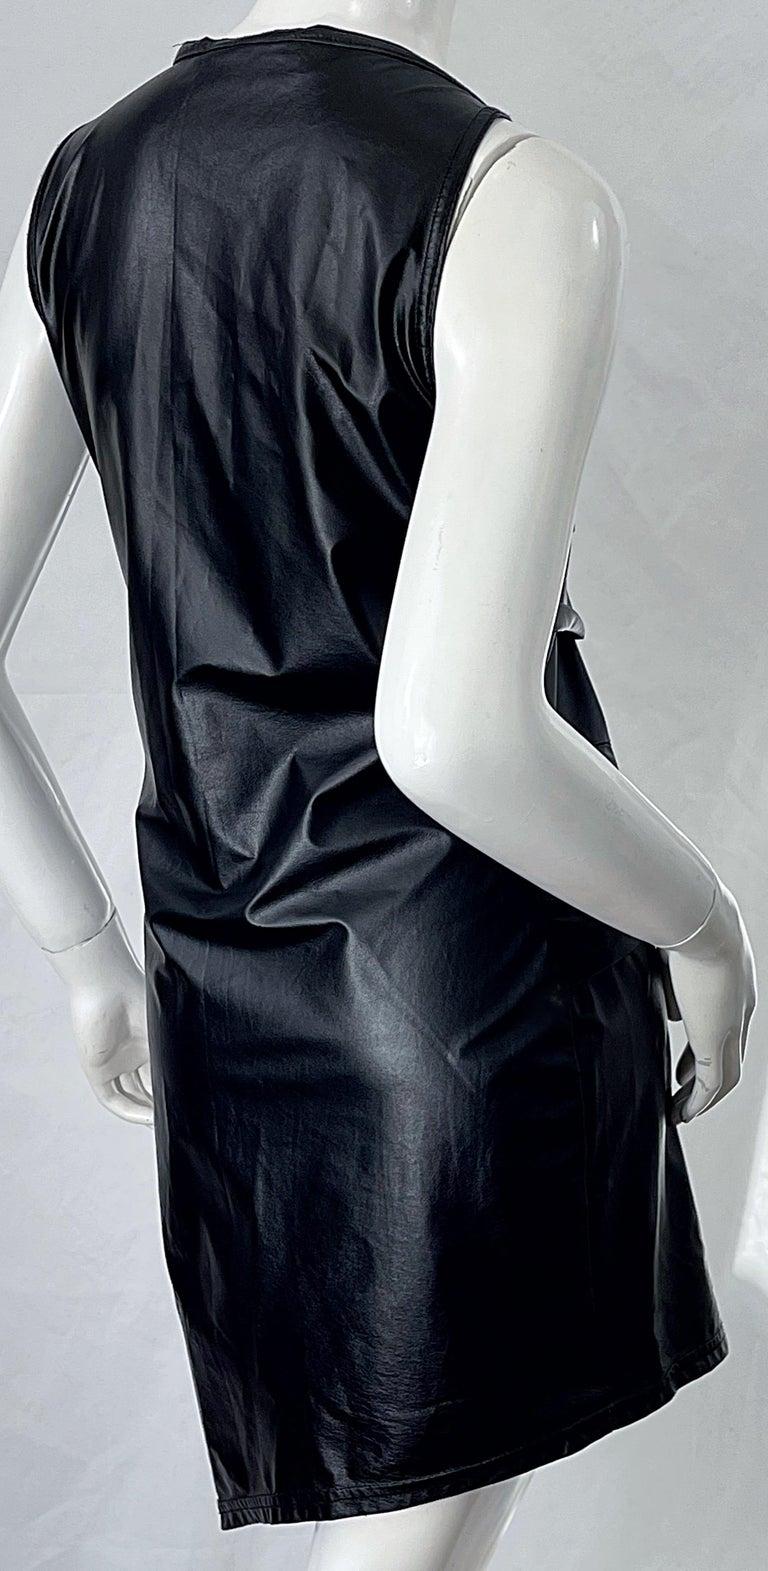 1990s Dexter Wong Club Kid Rave Japanese Black Pleather Vintage 90s Mini Dress For Sale 7